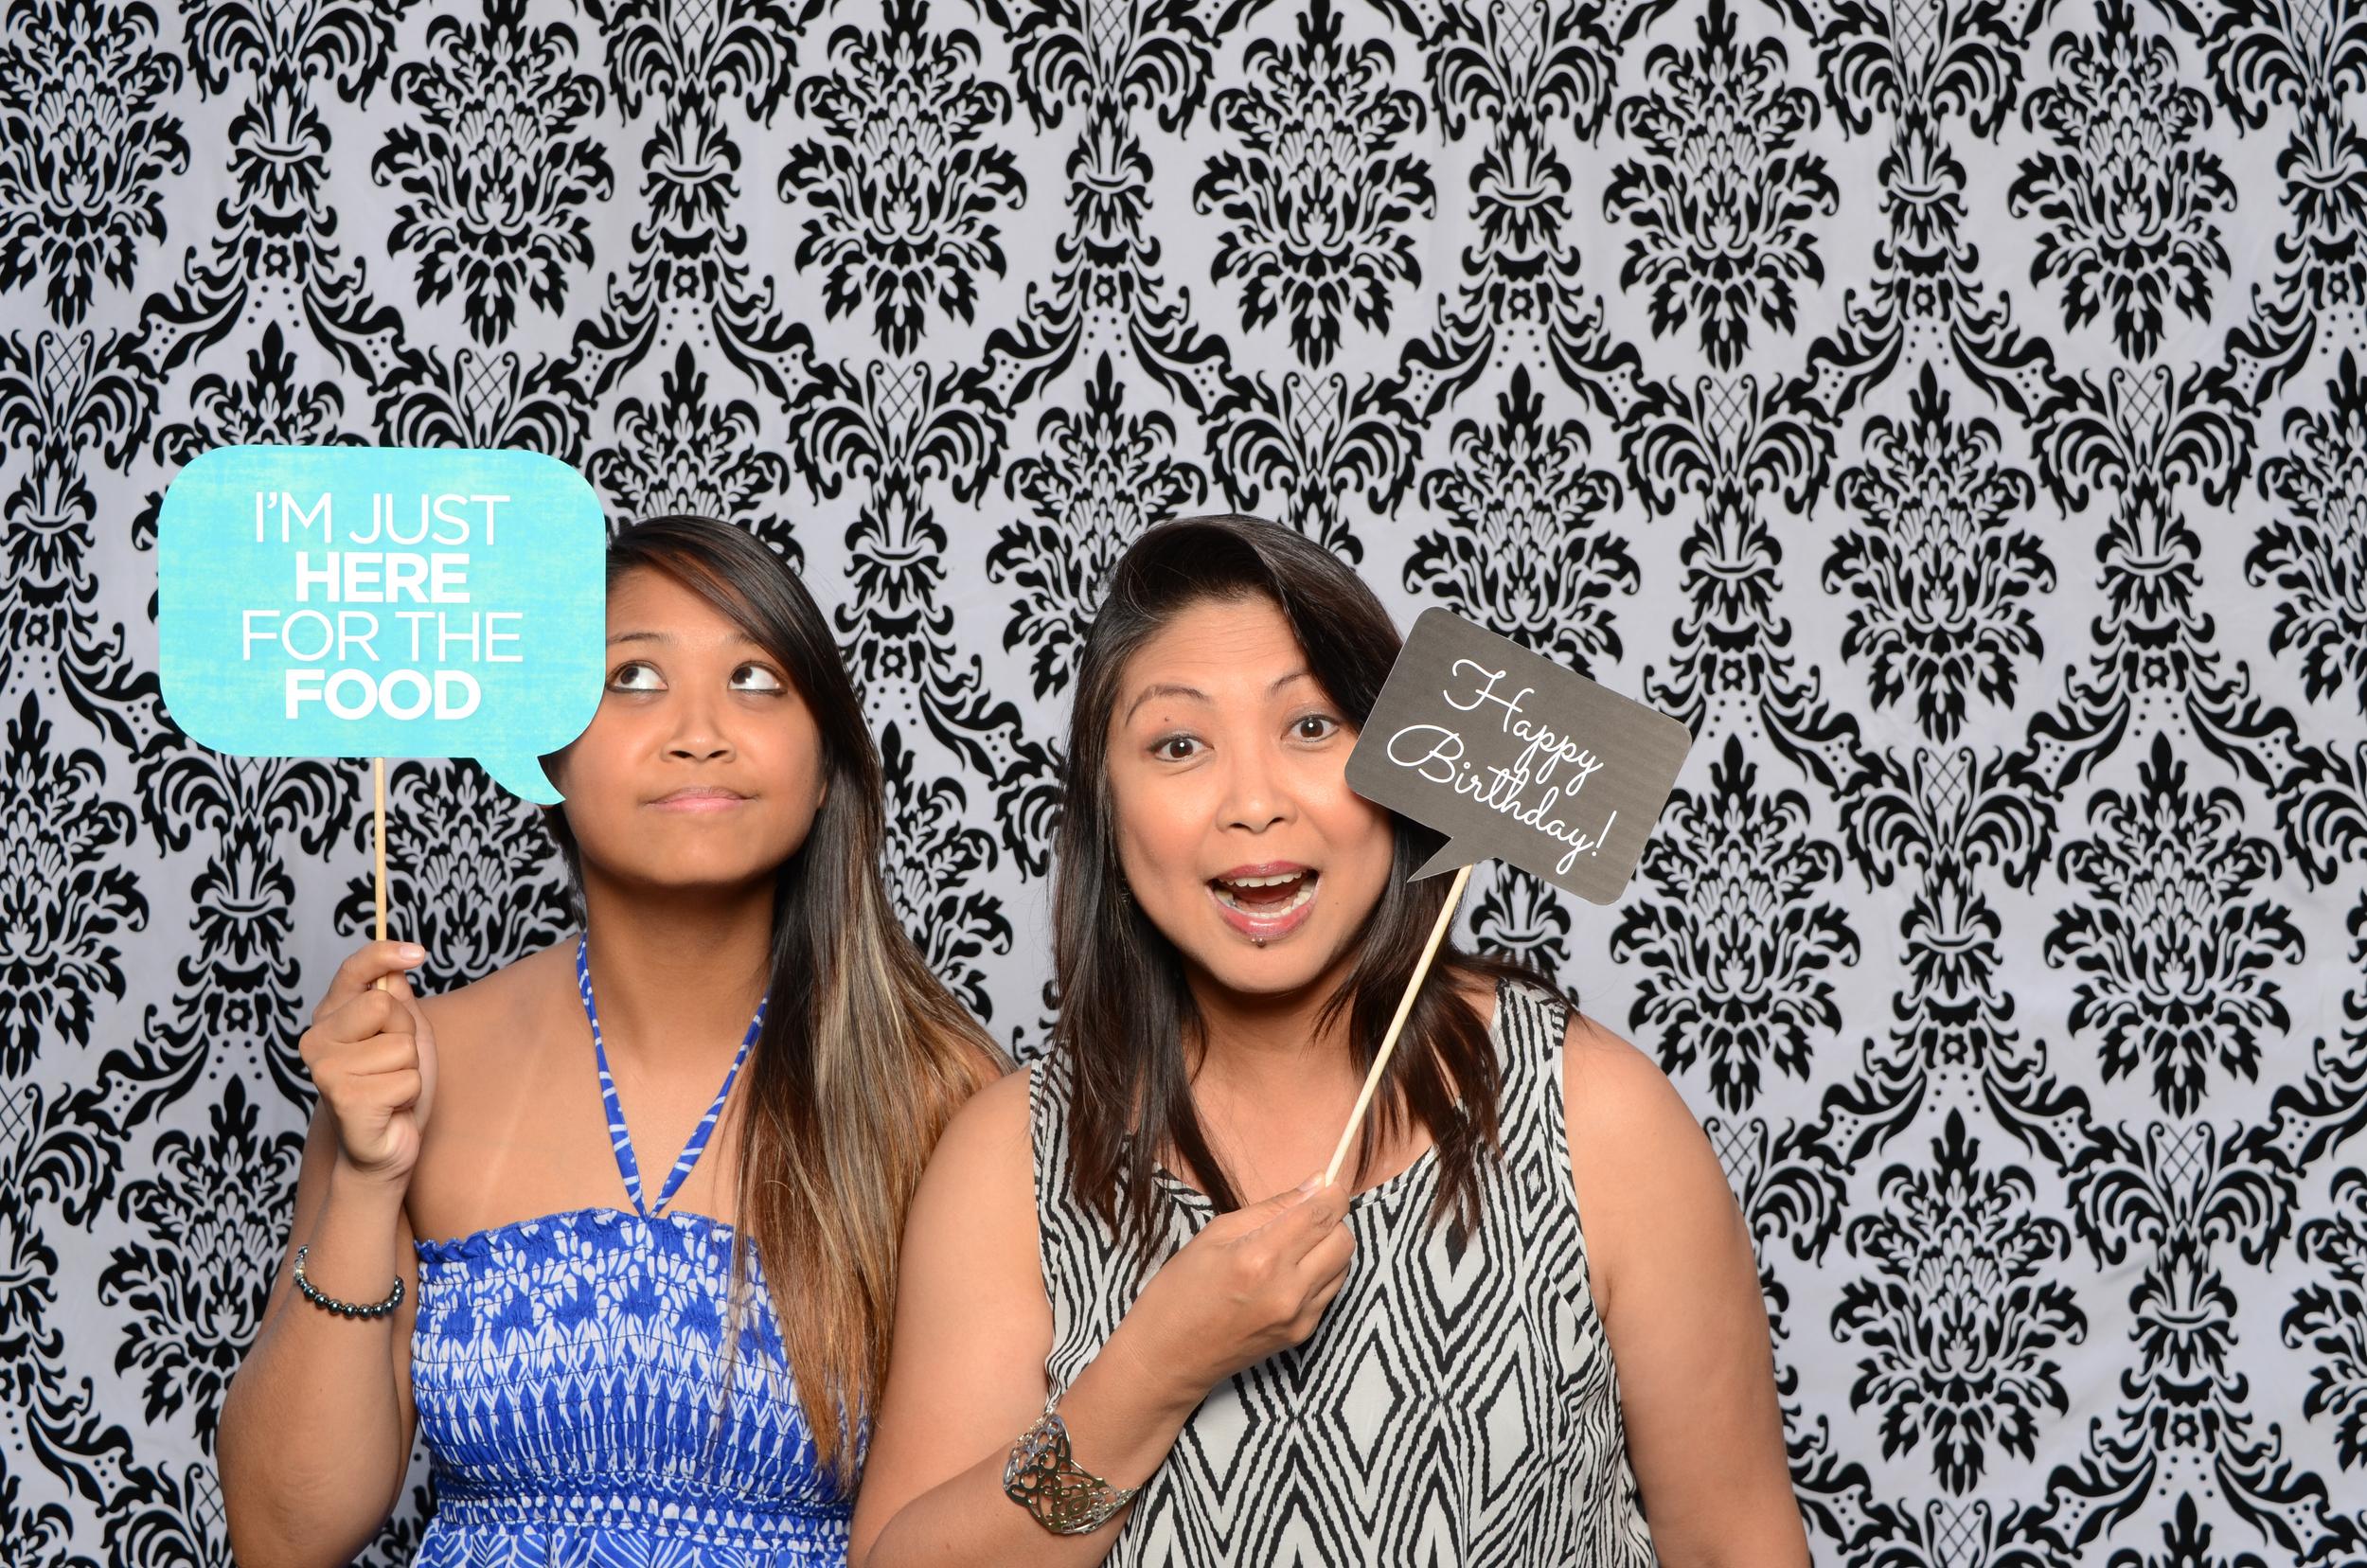 piscataway-graduation-birthday-photobooth-photo-3.jpg